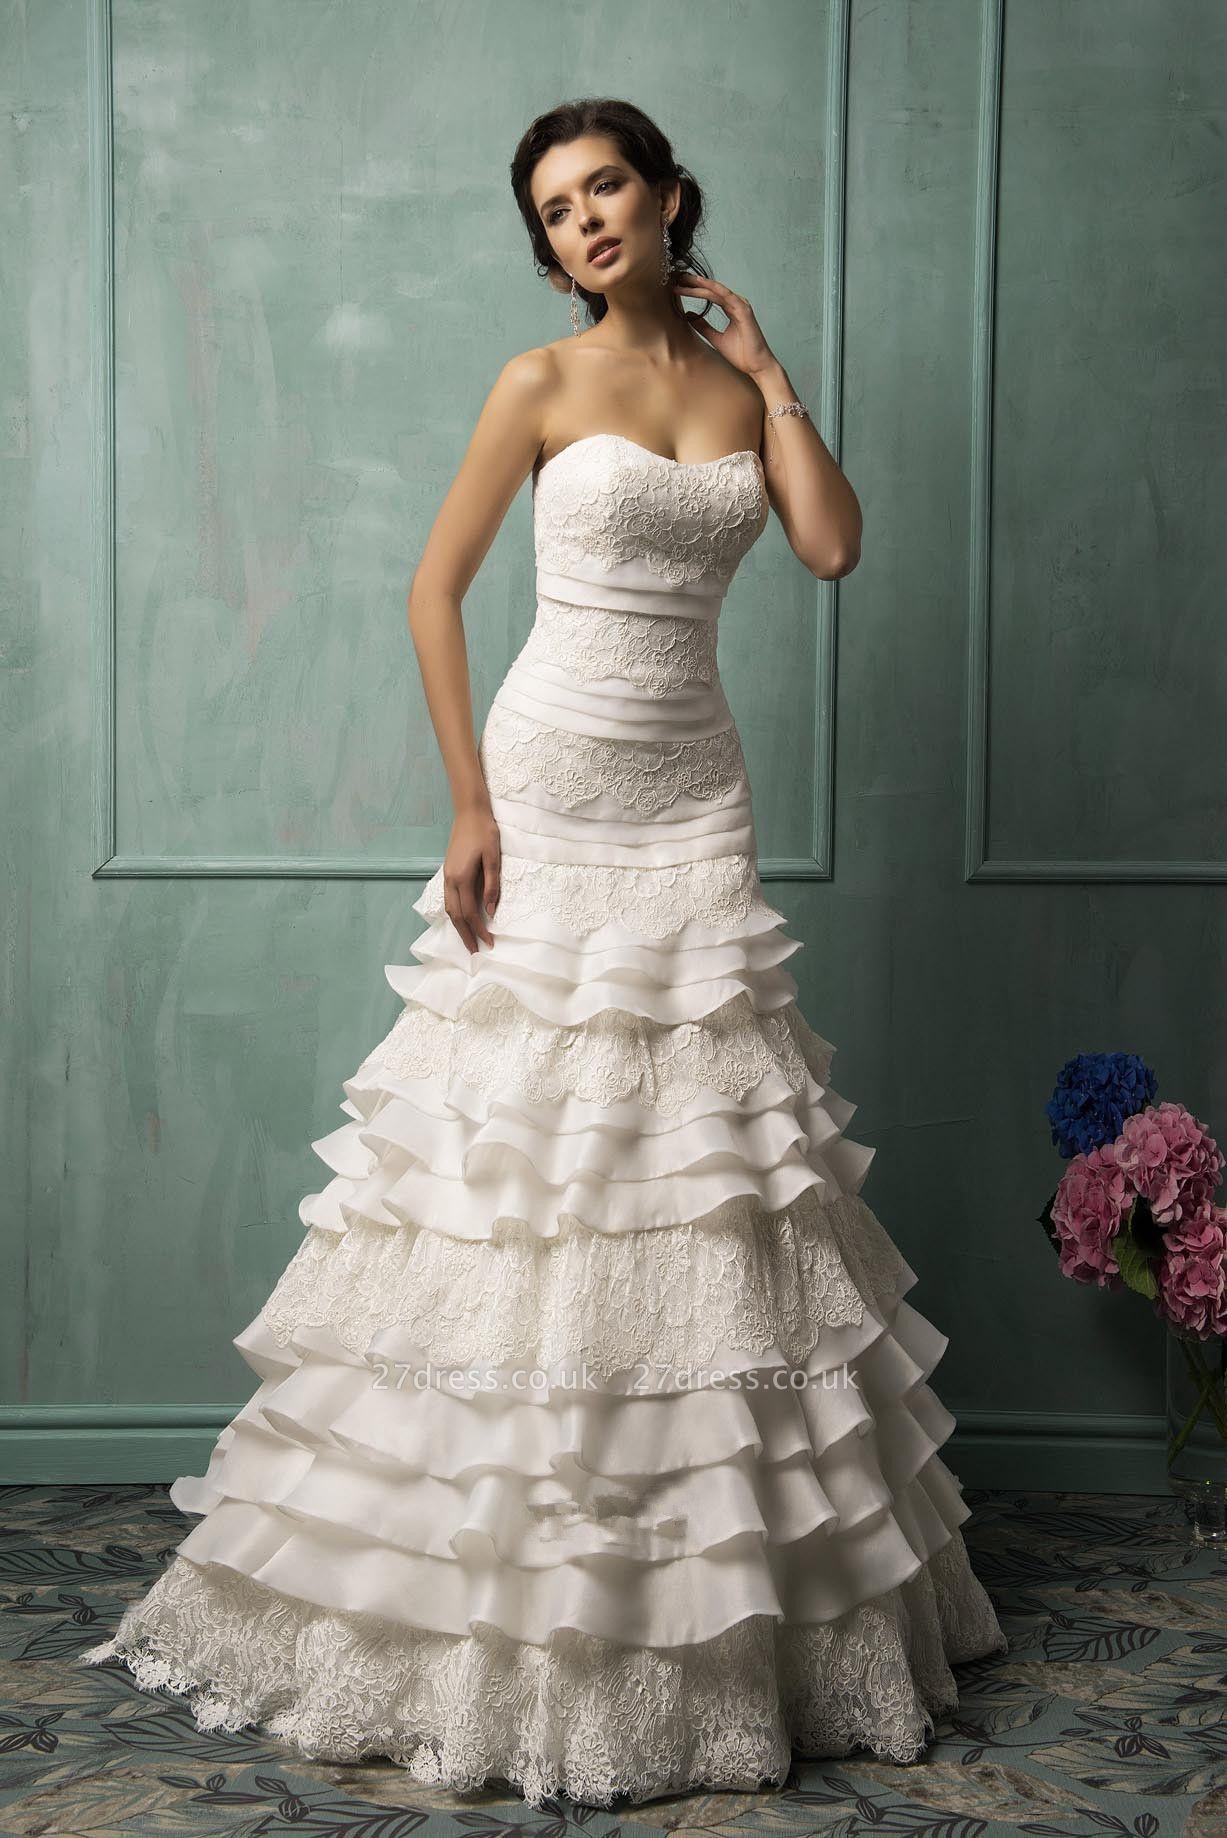 Timeless Sweetheart Sleeveless Lace Wedding Dress With Ruffles